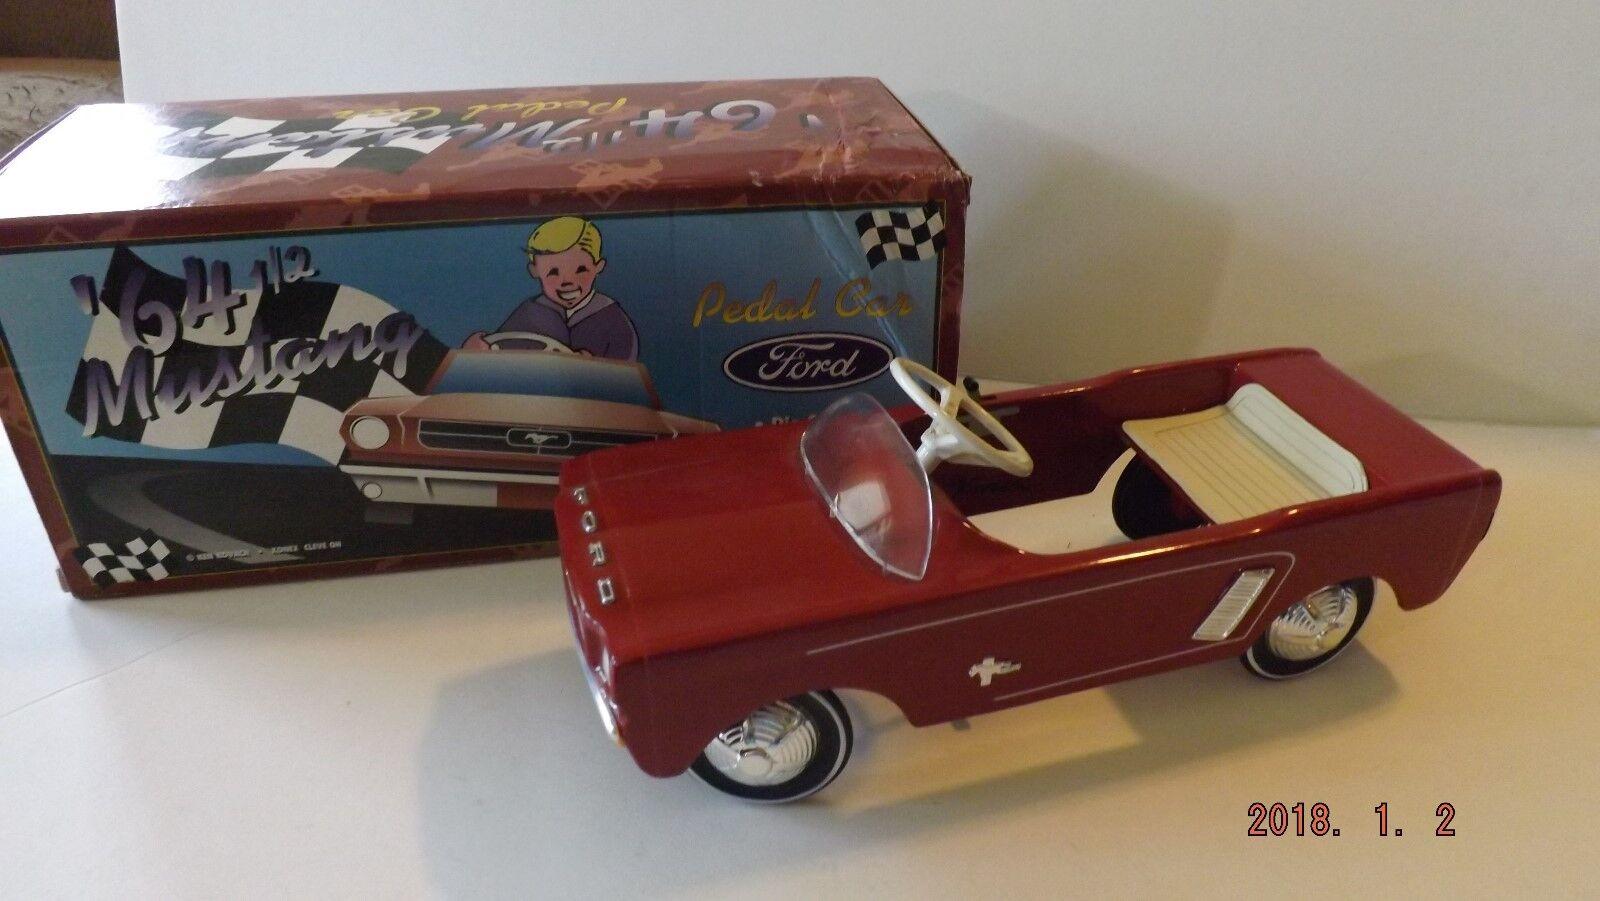 Ken kovach 641 2 mustang pedal car1 3 scale